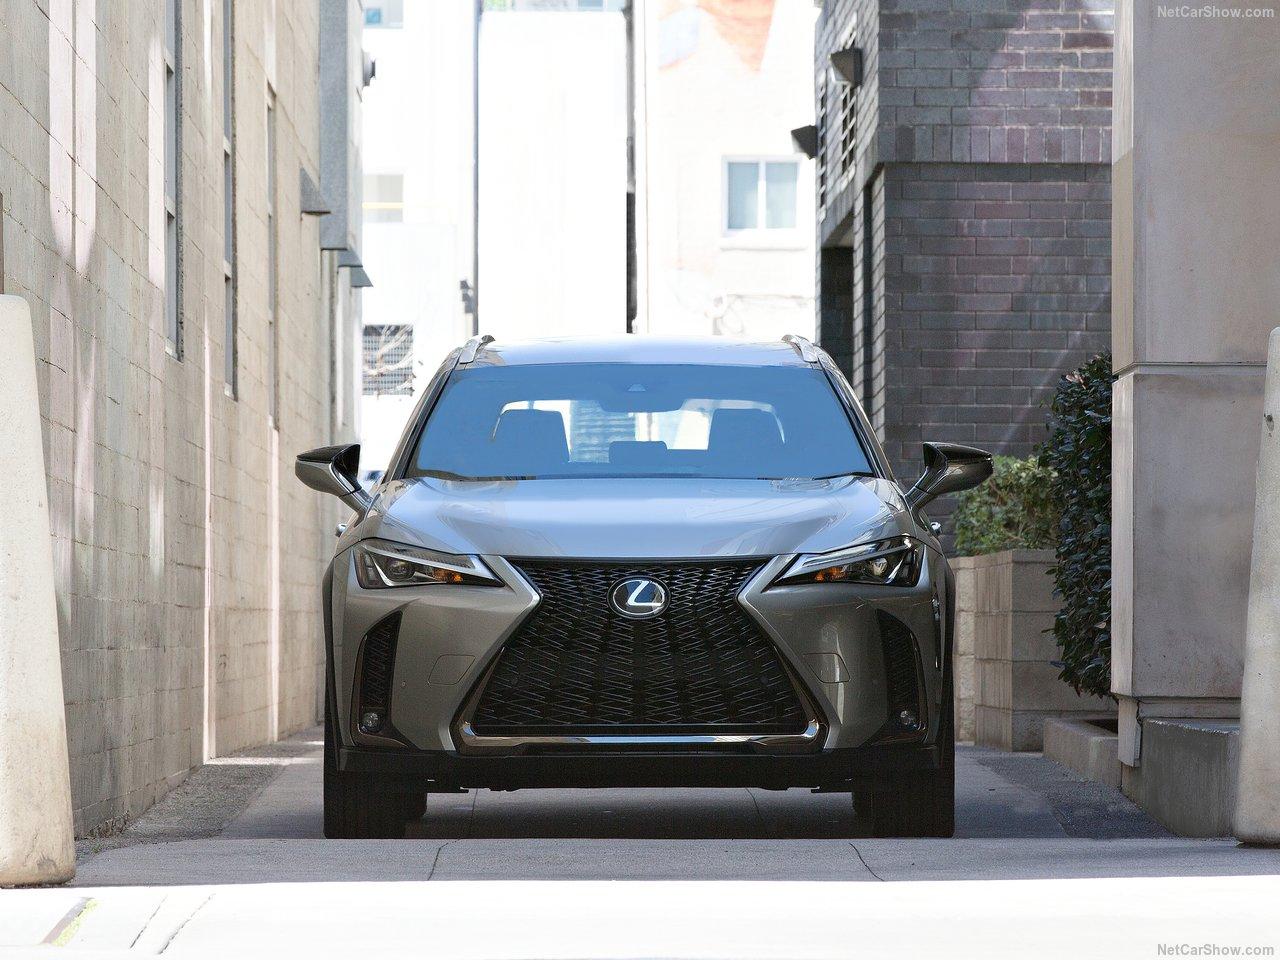 Lexus-UX-2019-1280-16.jpg